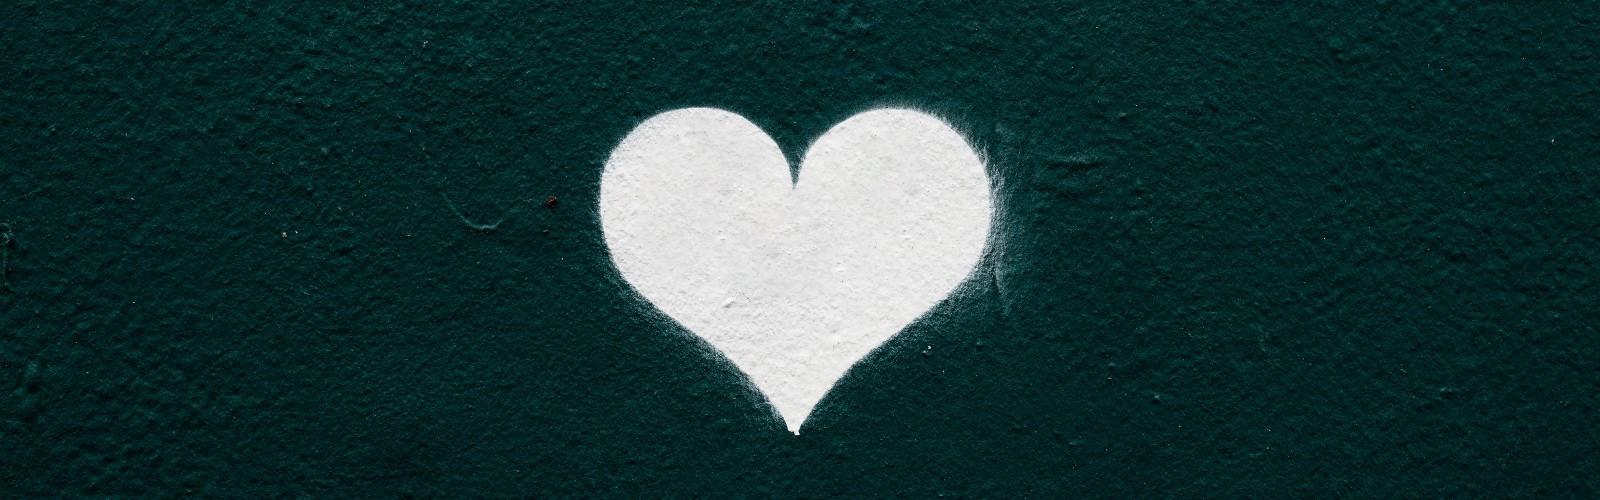 Image of white chalk heart on a dark background